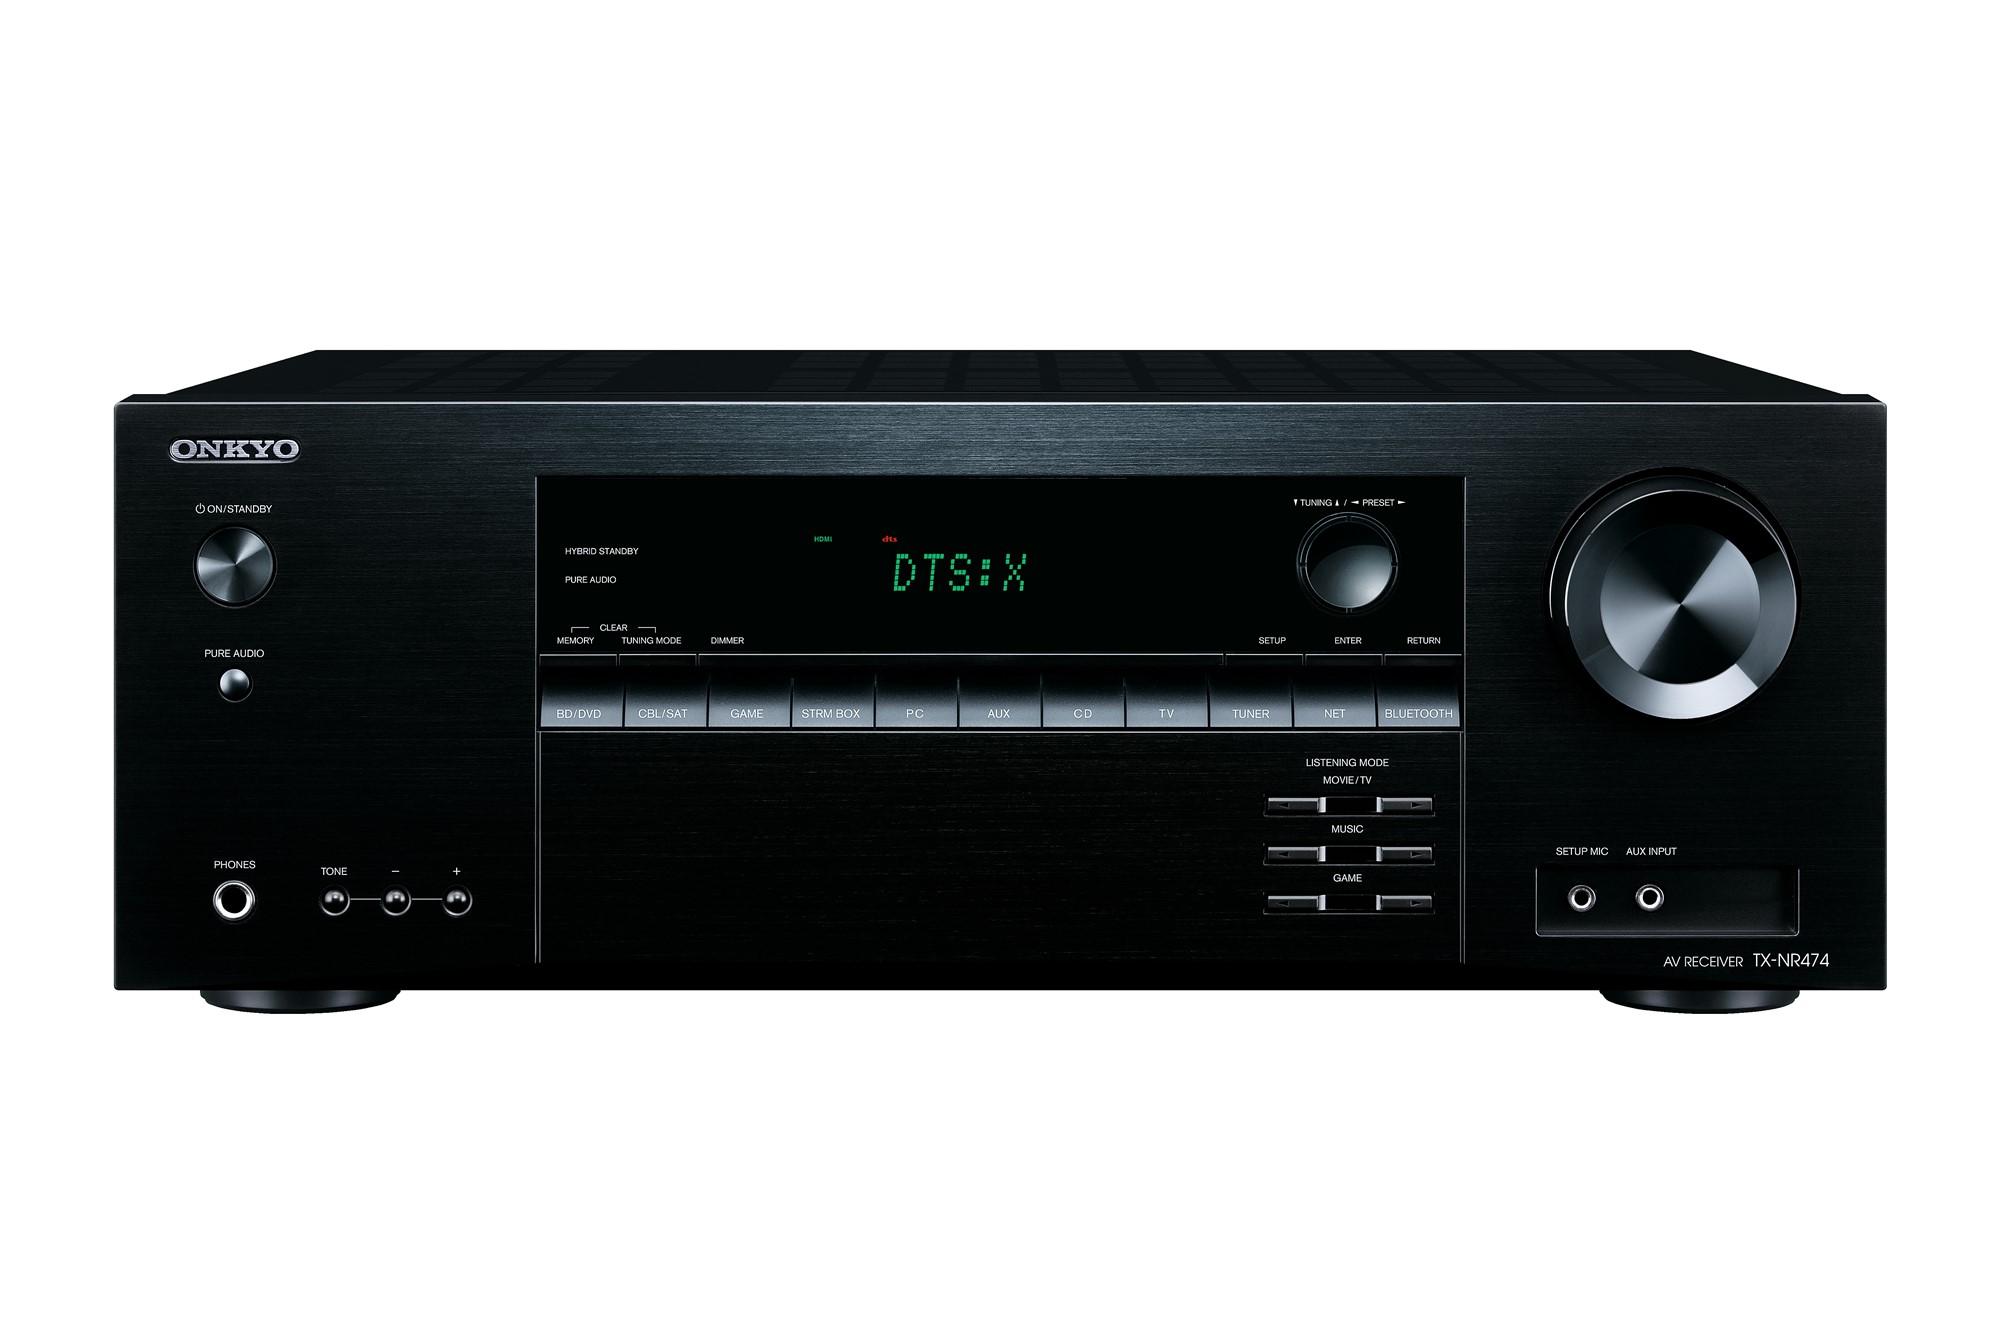 ONKYO TX-NR474 5.1channels Surround 3D Black AV receiver